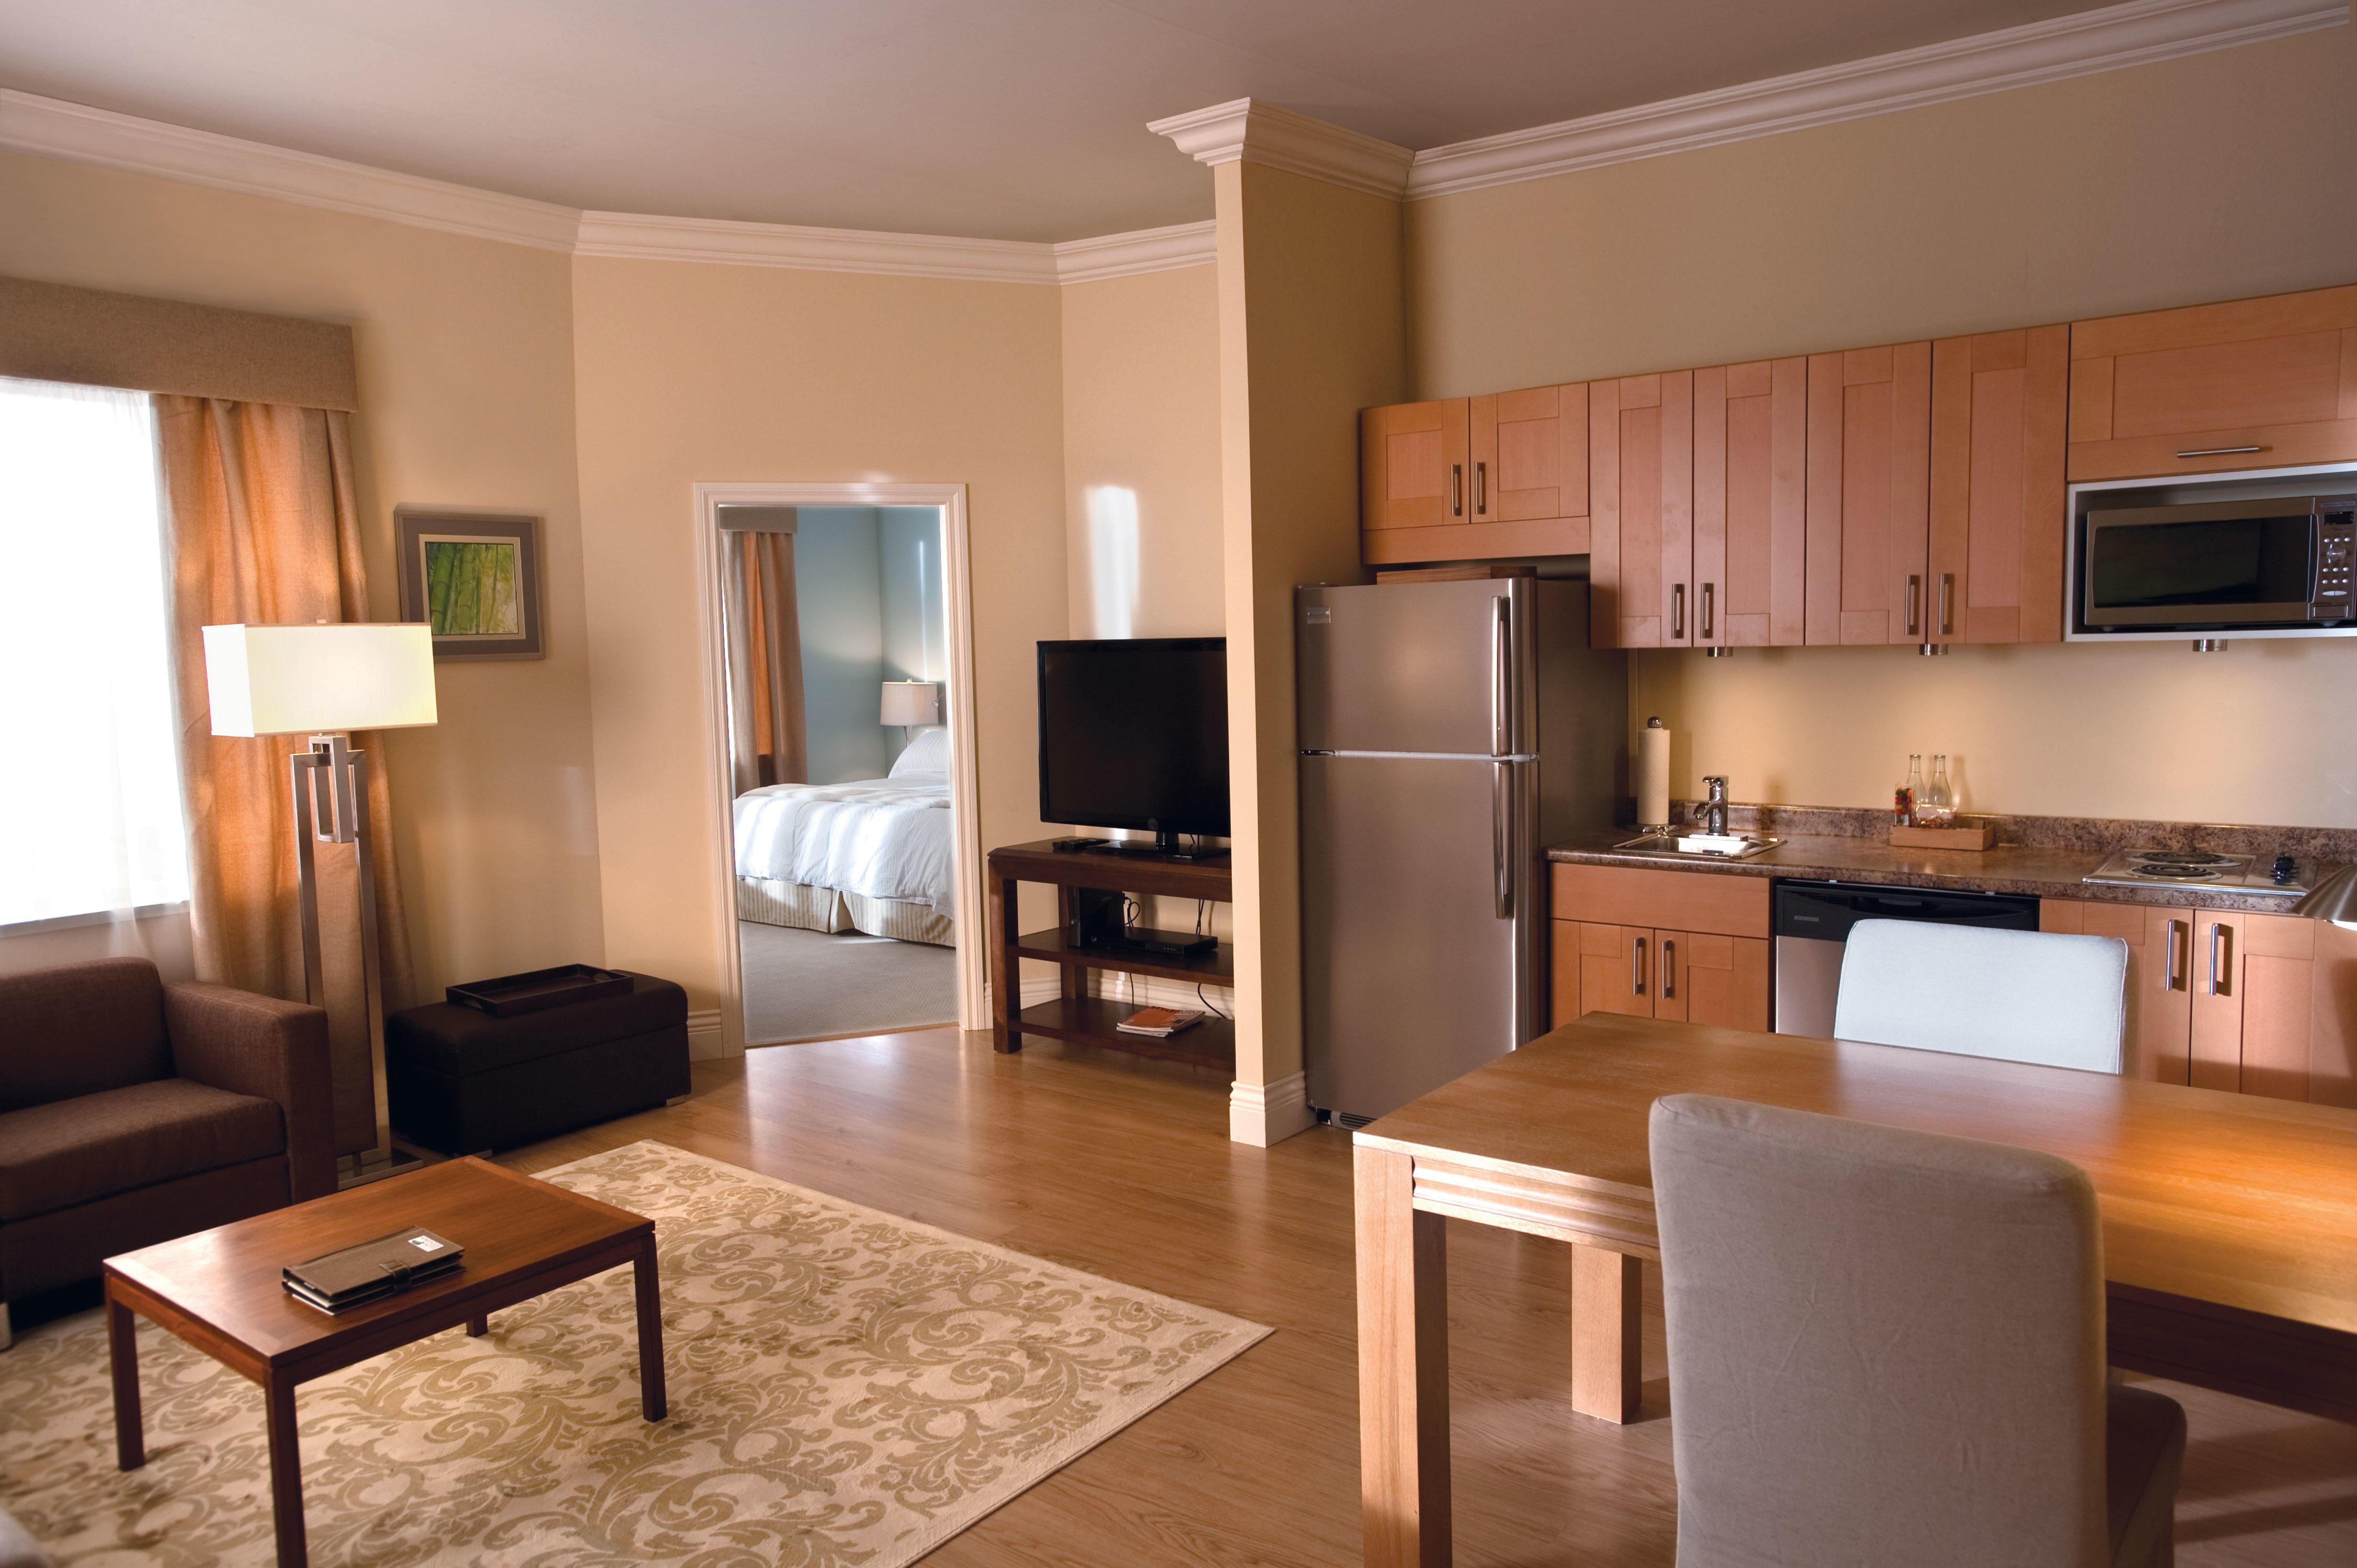 homewood suites by hilton san bernardino san bernardino. Black Bedroom Furniture Sets. Home Design Ideas